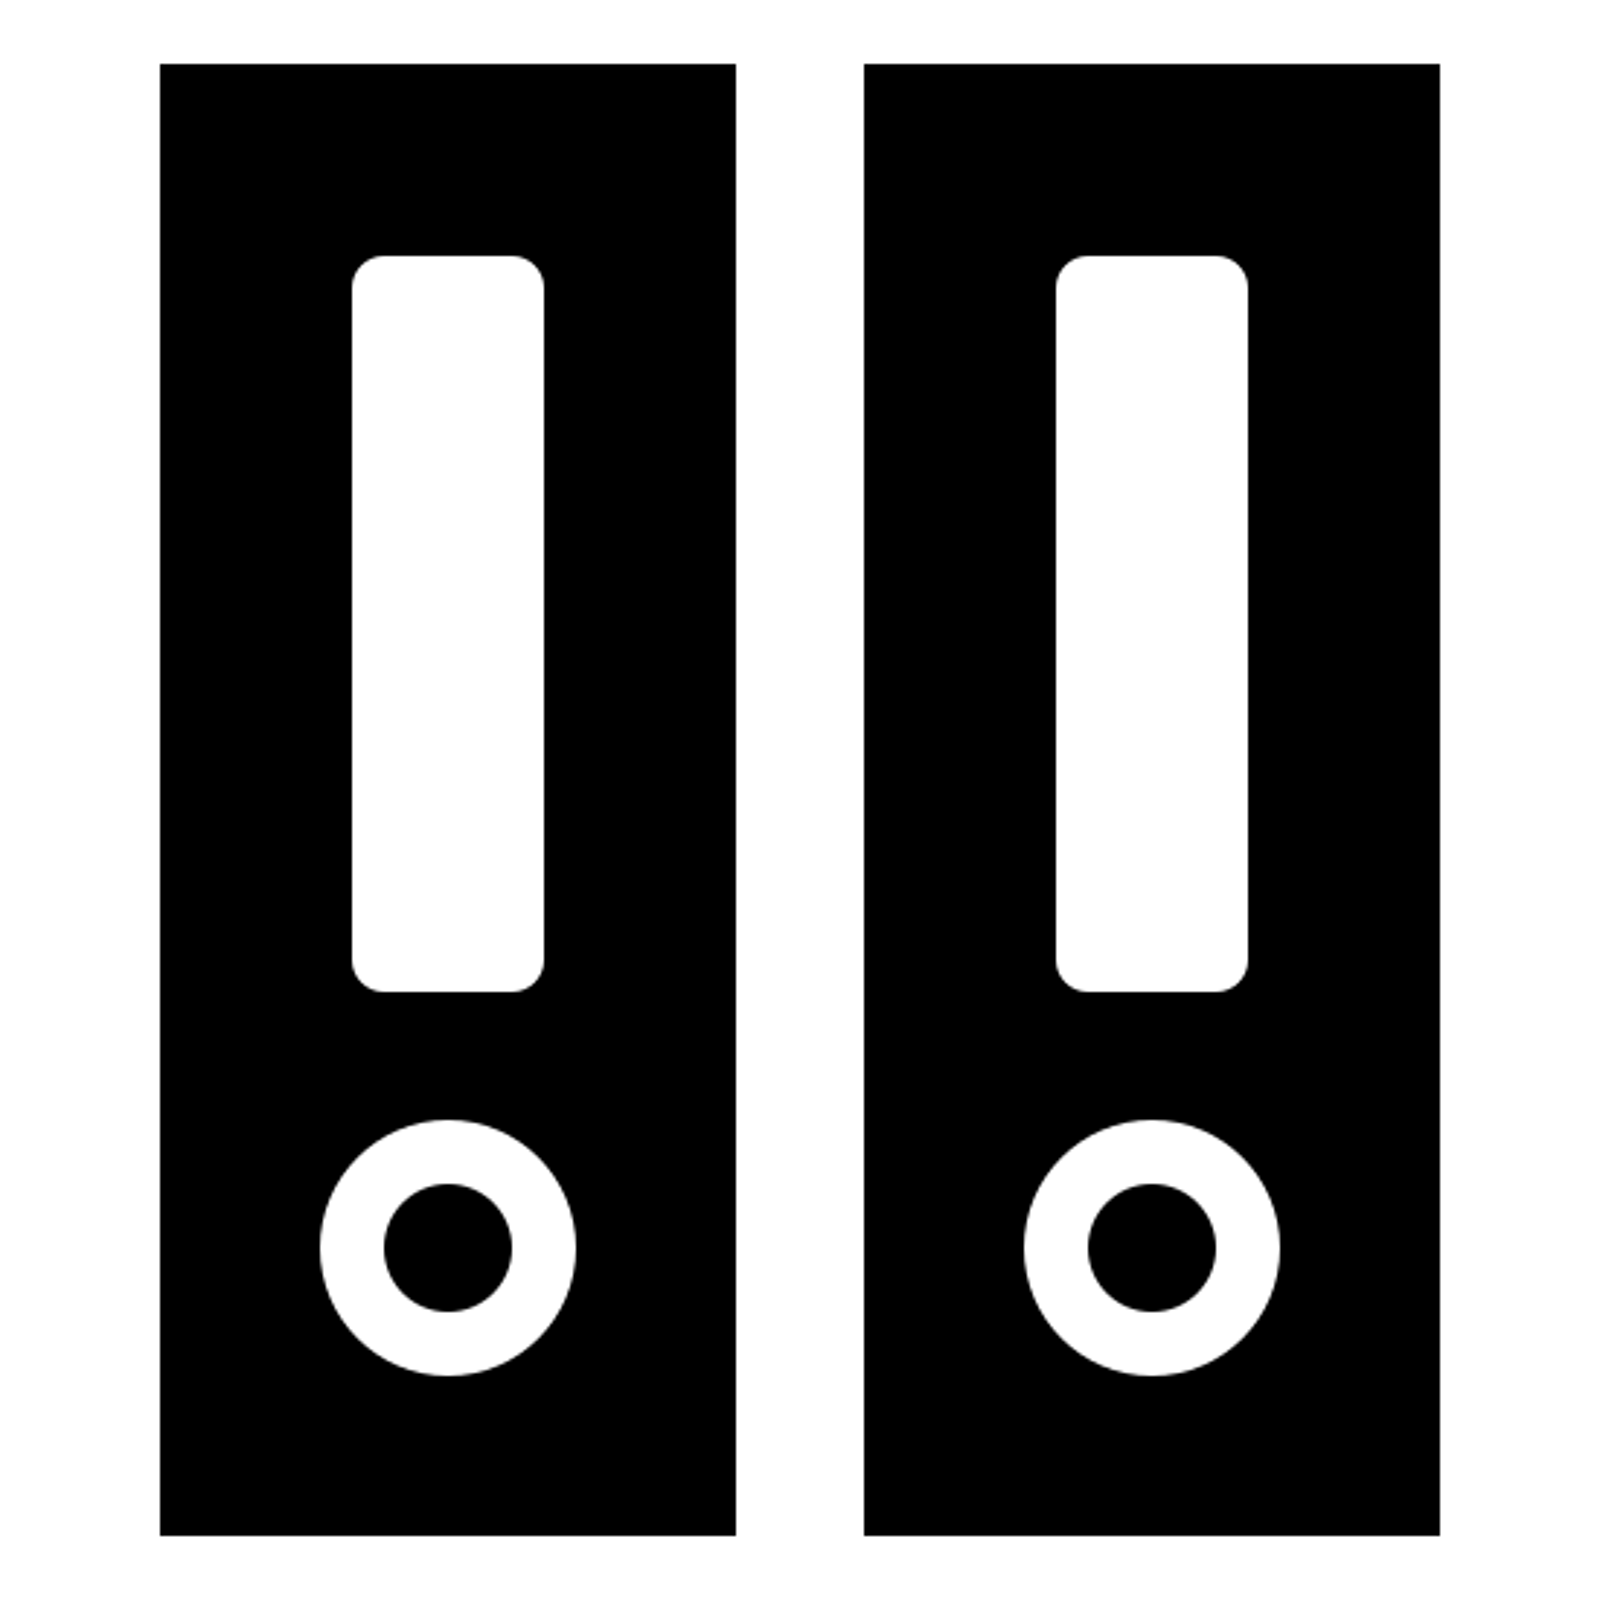 Binder Filled icon